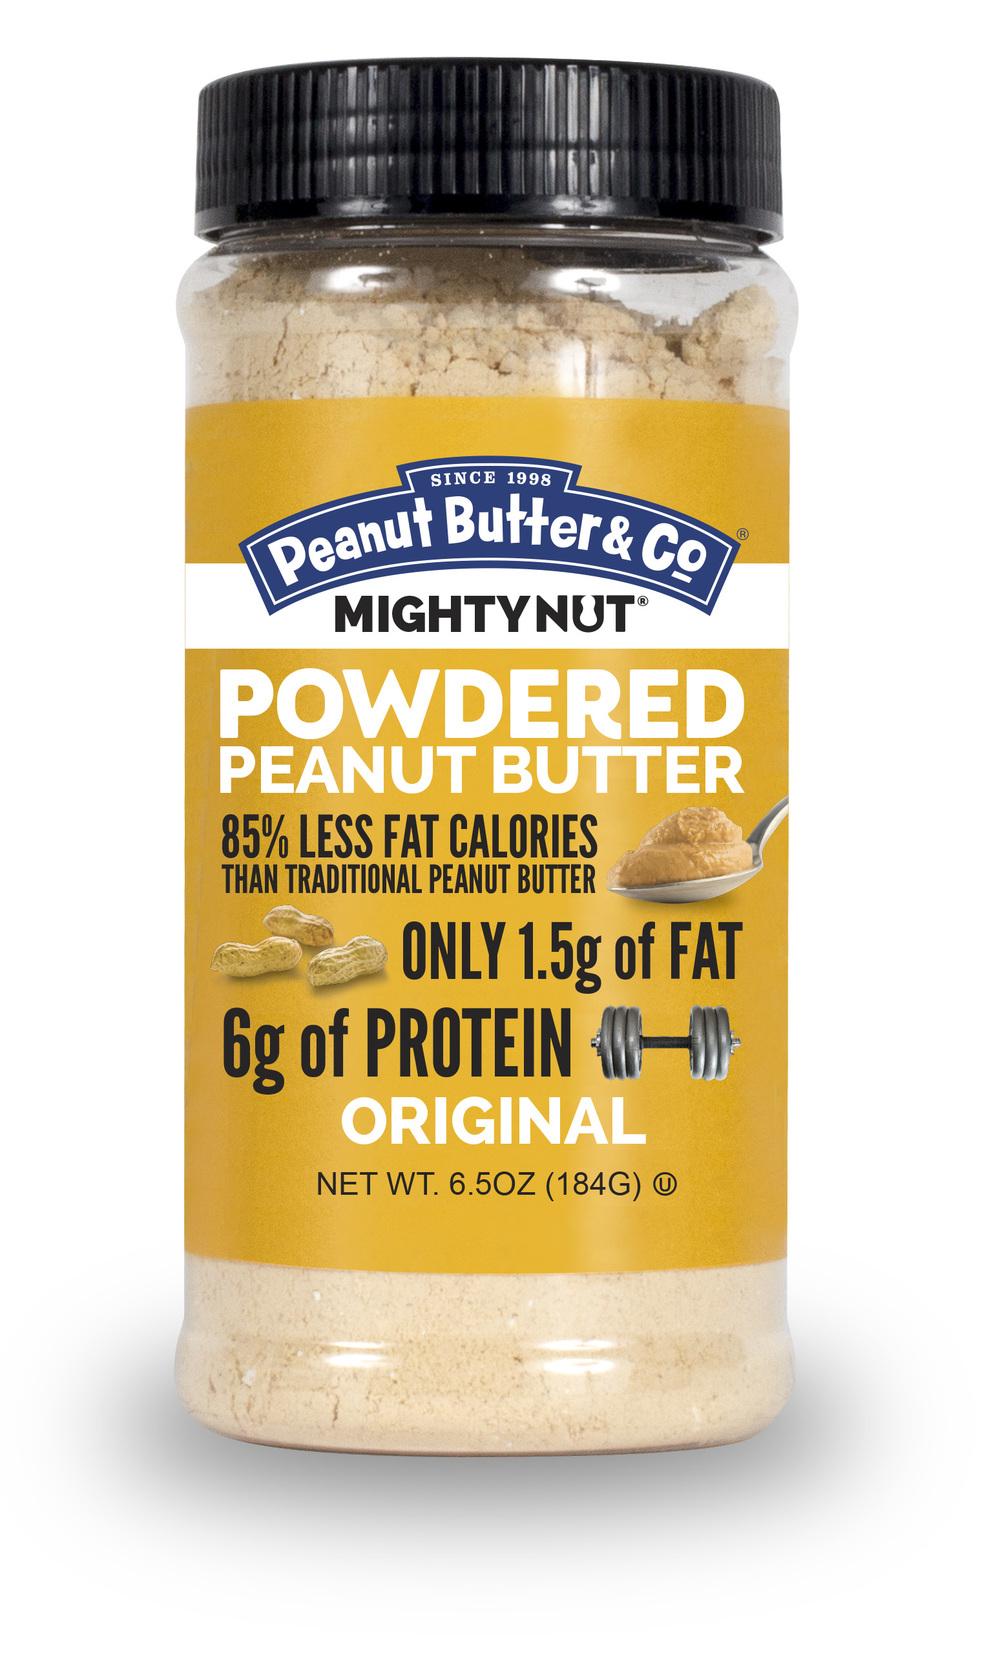 MightyNut-Original-Powdered-peanut-butter.jpg